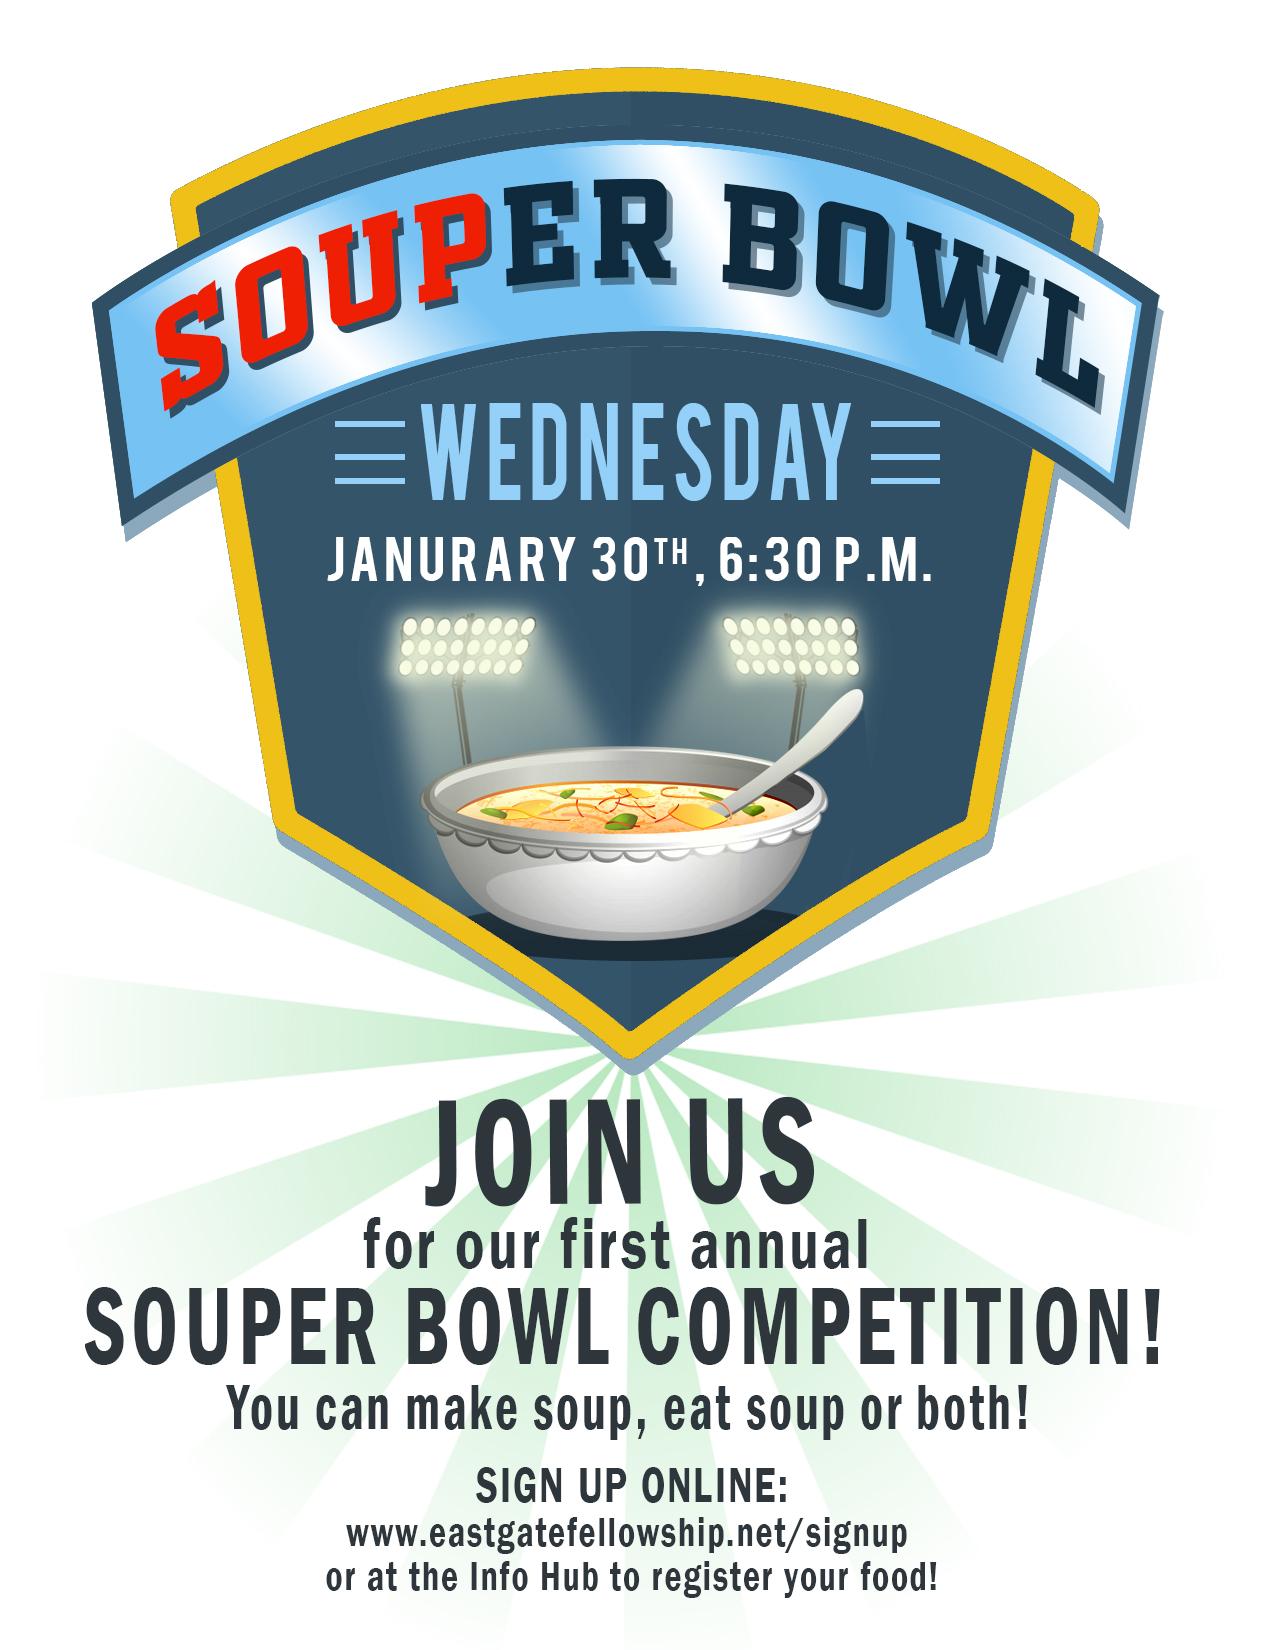 souperbowl wednesday - flyer.jpg